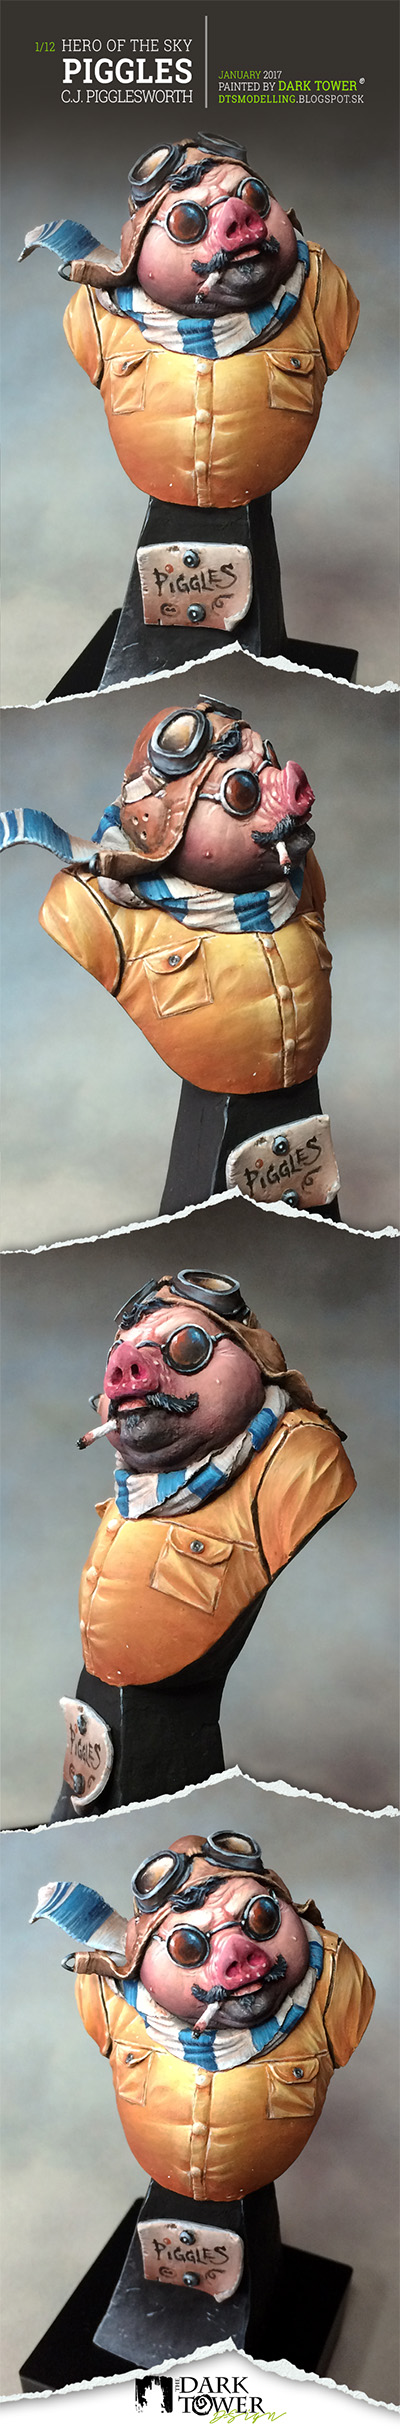 PIGGLES - C.J. Pigglesworth (Ben Komets Miniatures)